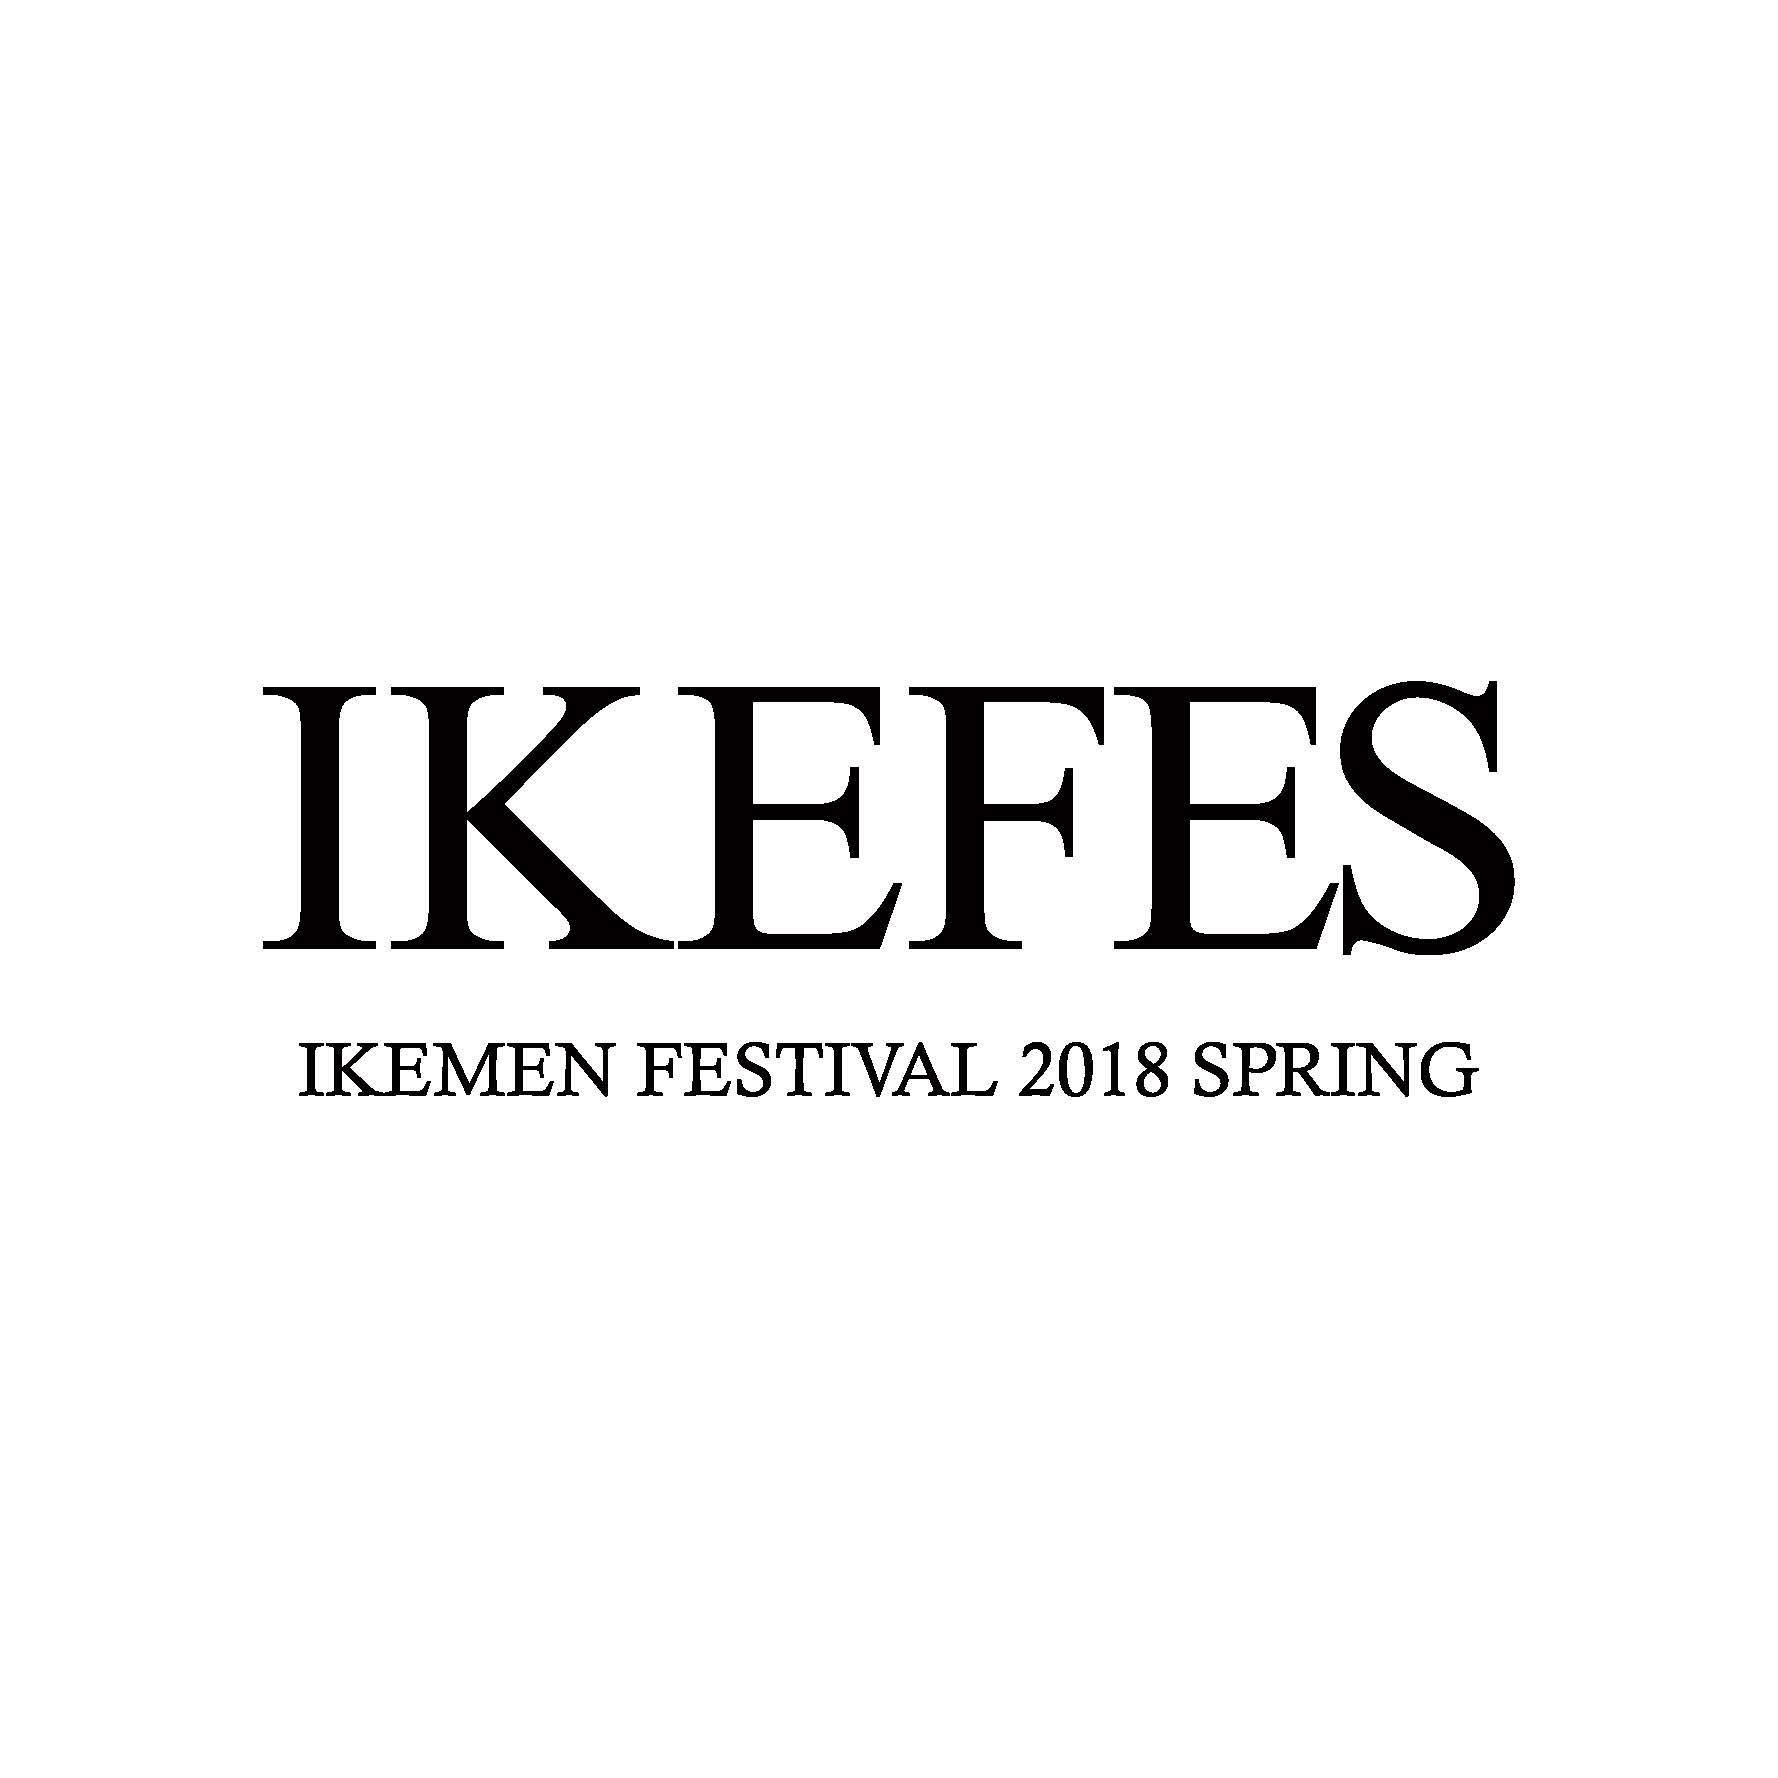 IKEFES 2018 spring